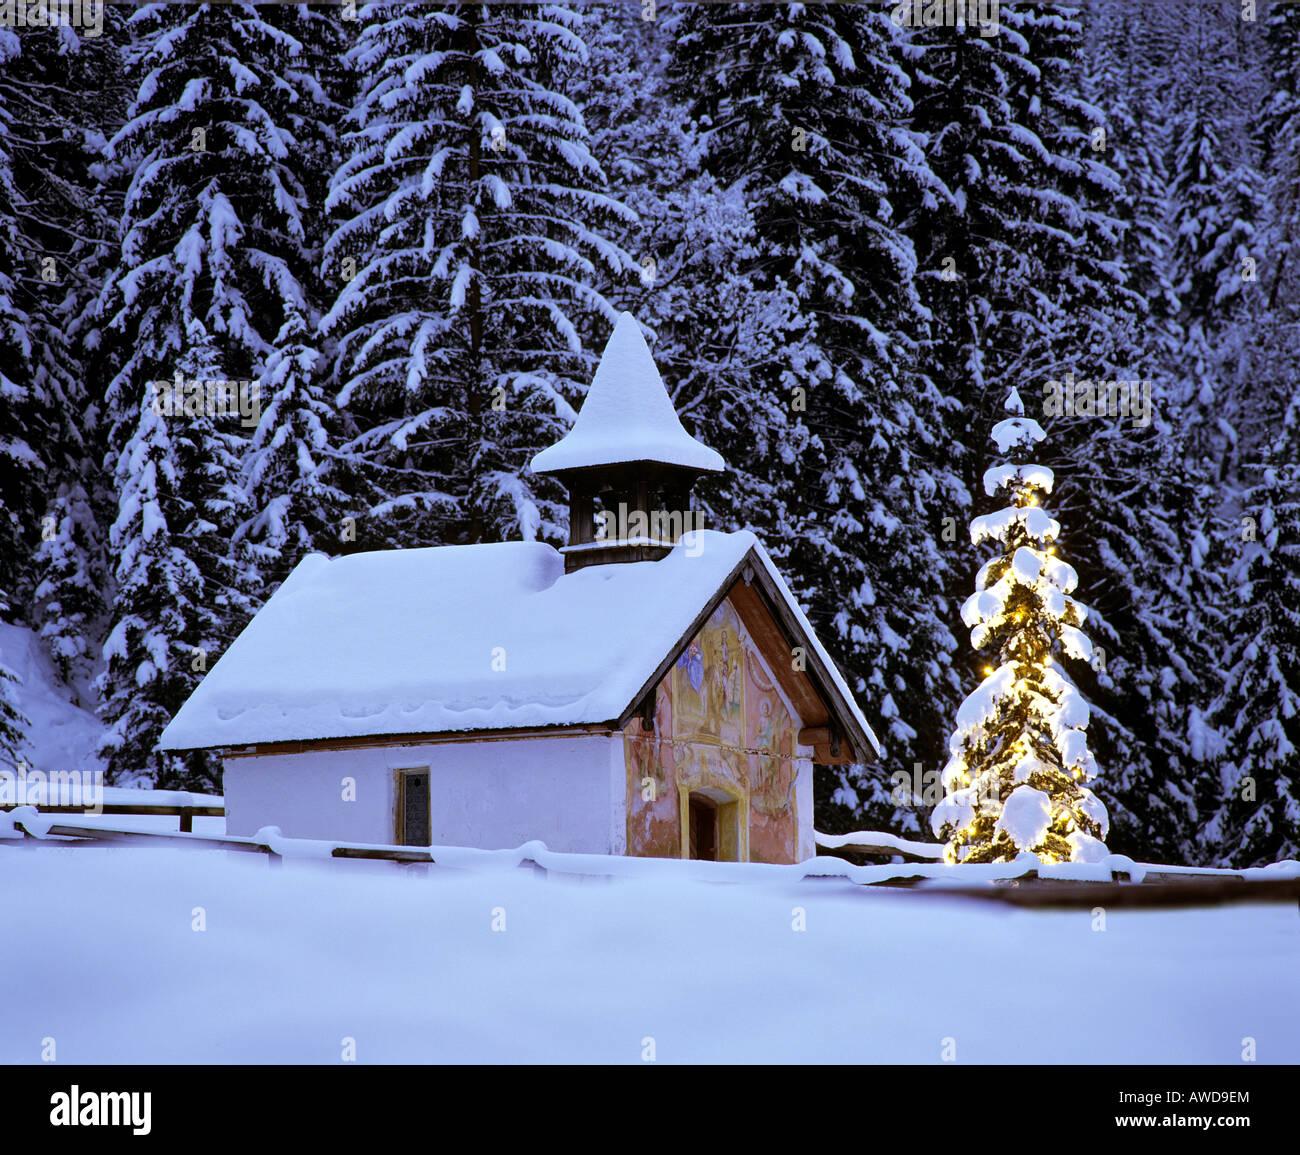 winter forest christmas tree evening christmas stockfotos. Black Bedroom Furniture Sets. Home Design Ideas